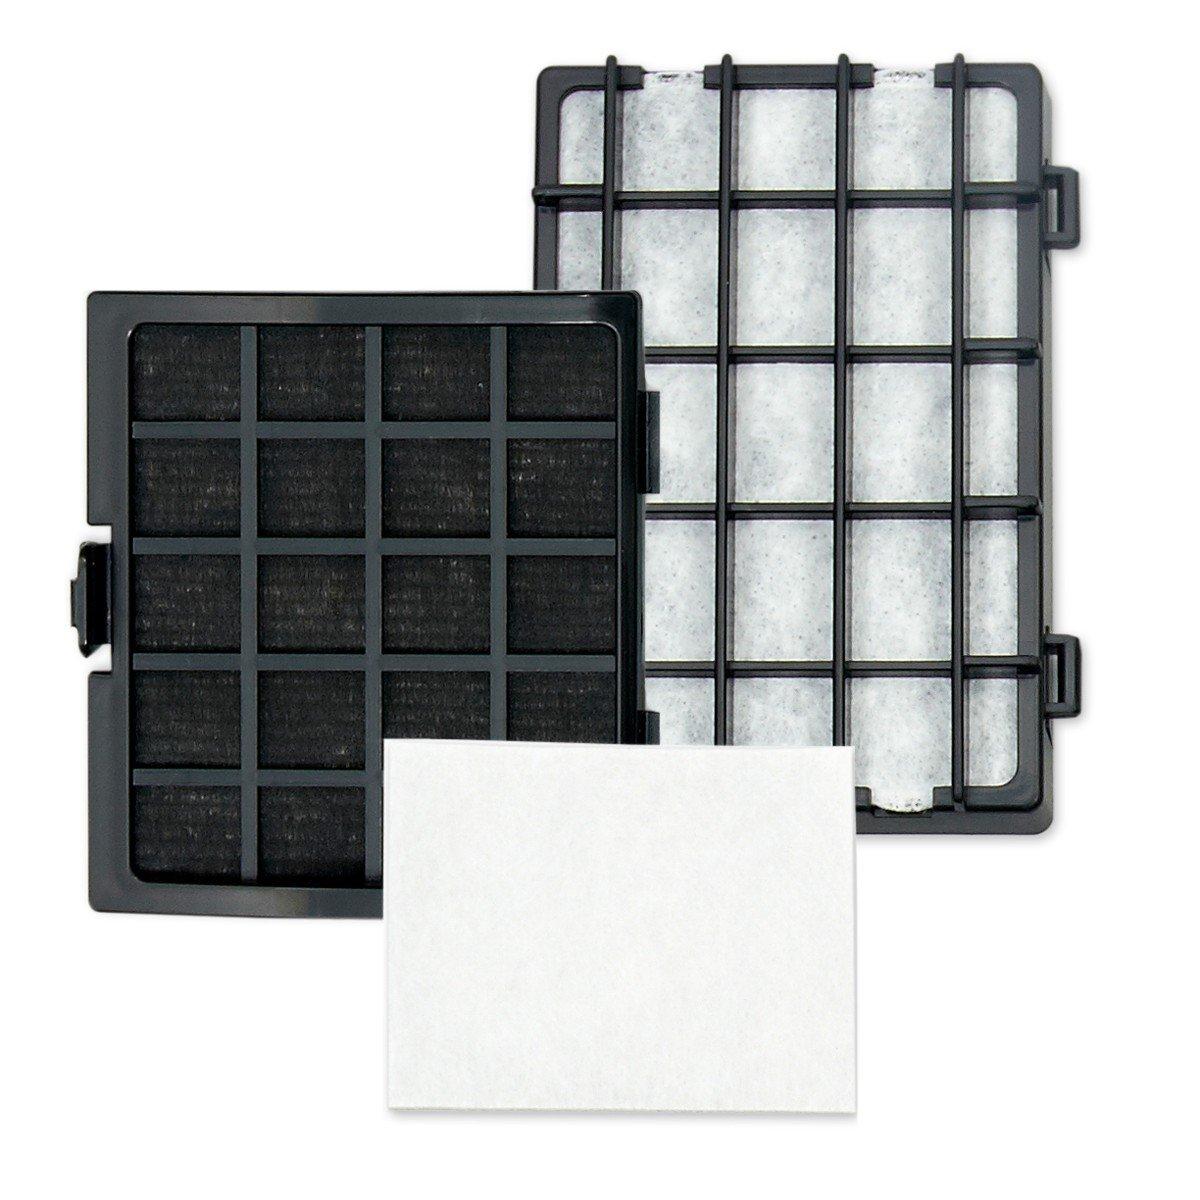 Riccar Brilliance HEPA and Charcoal Filter Set - Part No. RF30P